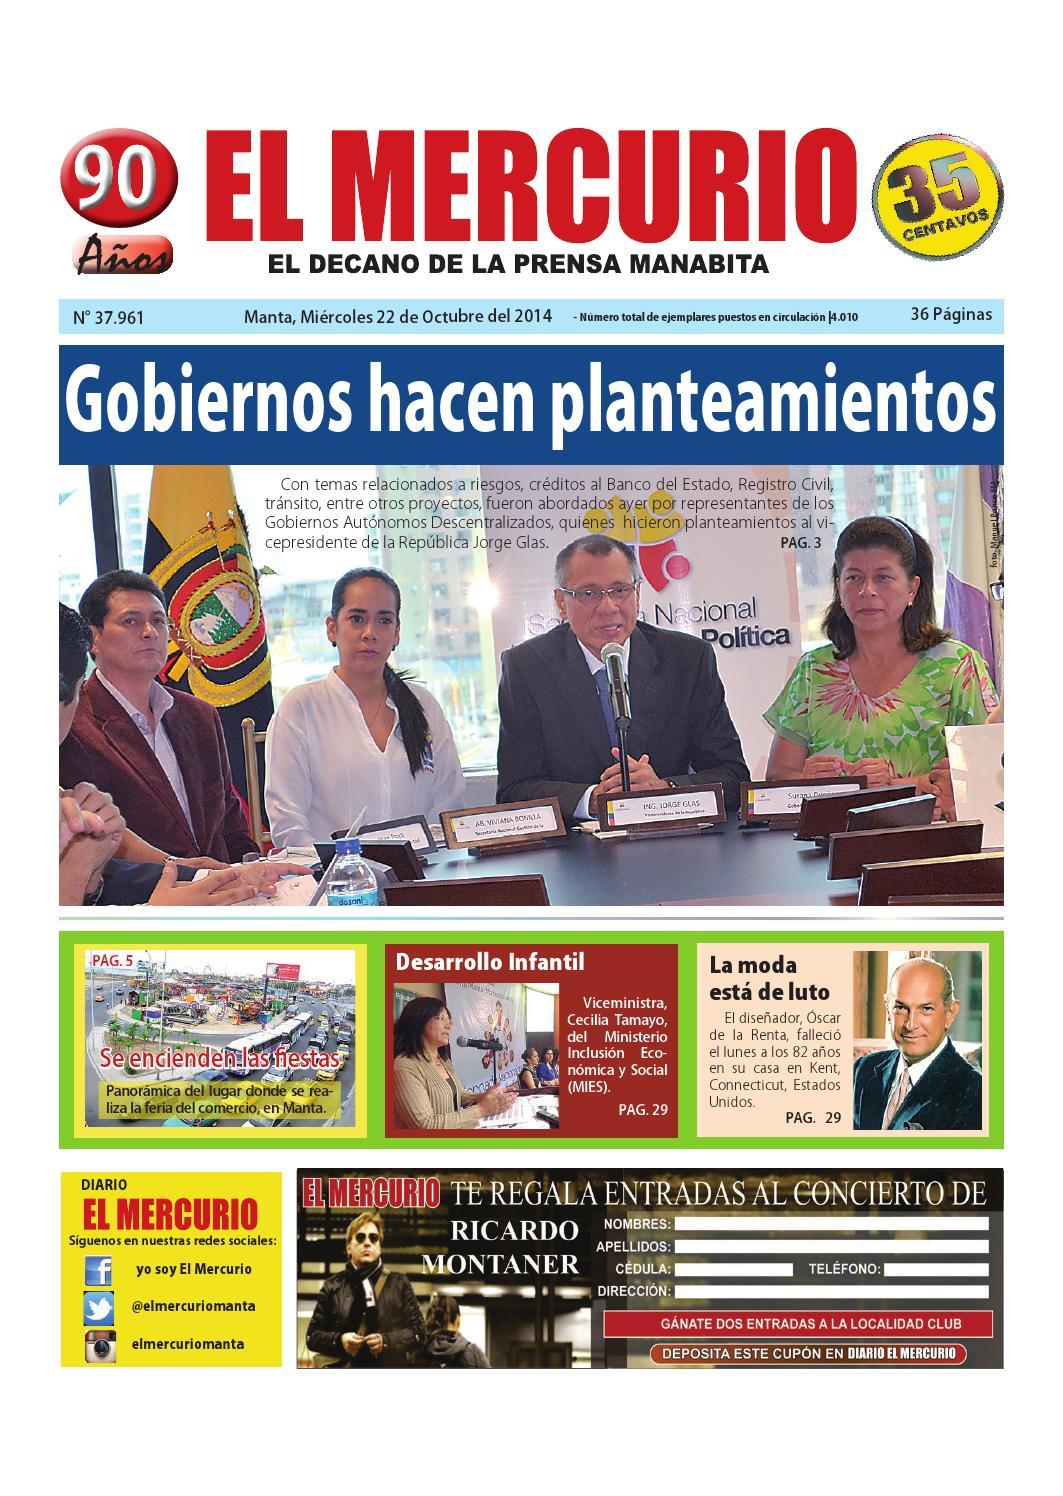 Mercurio miercoles 22 de octubre 2014 by Diario El mercurio - issuu d1aa6e0a06e